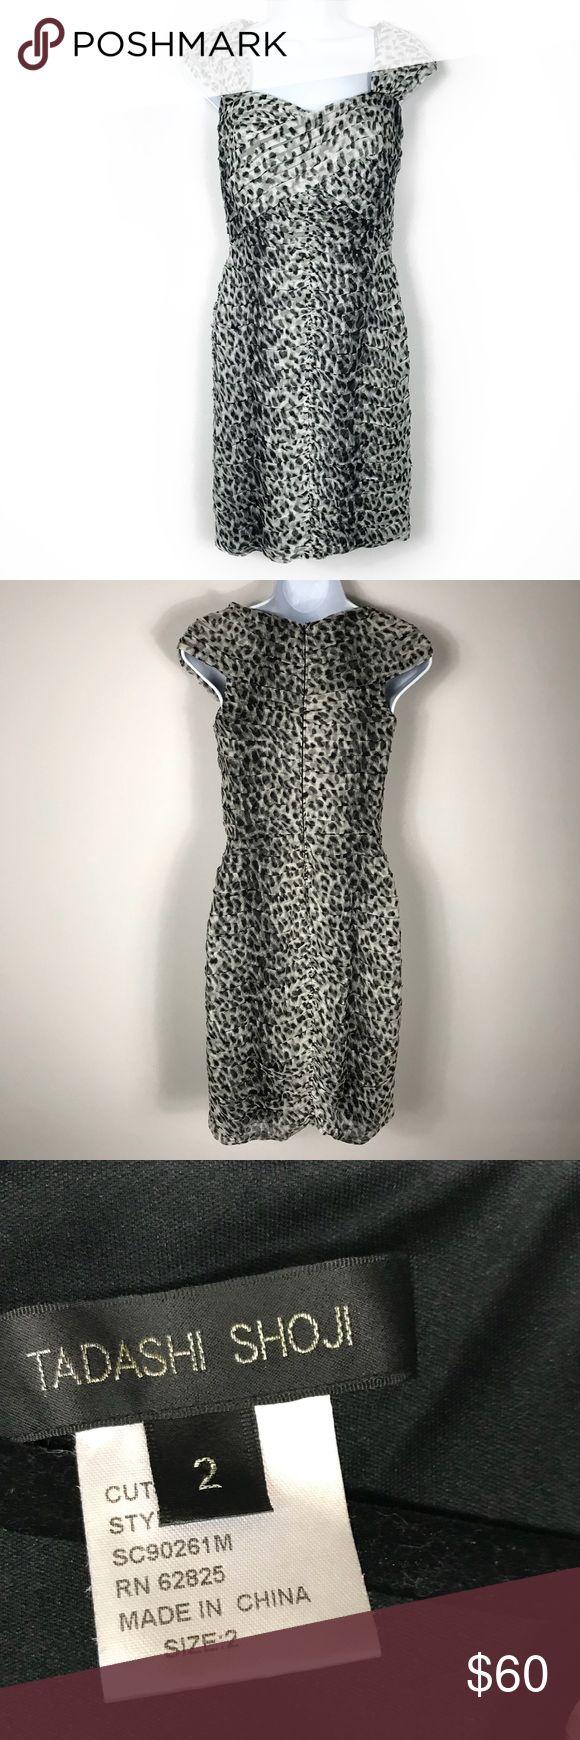 "Tadashi shoji silk Pleated leopard dress Tadashi shoji silk Pleated leopard dress size 2. Super slimming and sexy. Measures approx 15.5""Bust 13.5""Waist 17"" hip 34.5"" long. Dry cleaned and ready to wear Tadashi Shoji Dresses"